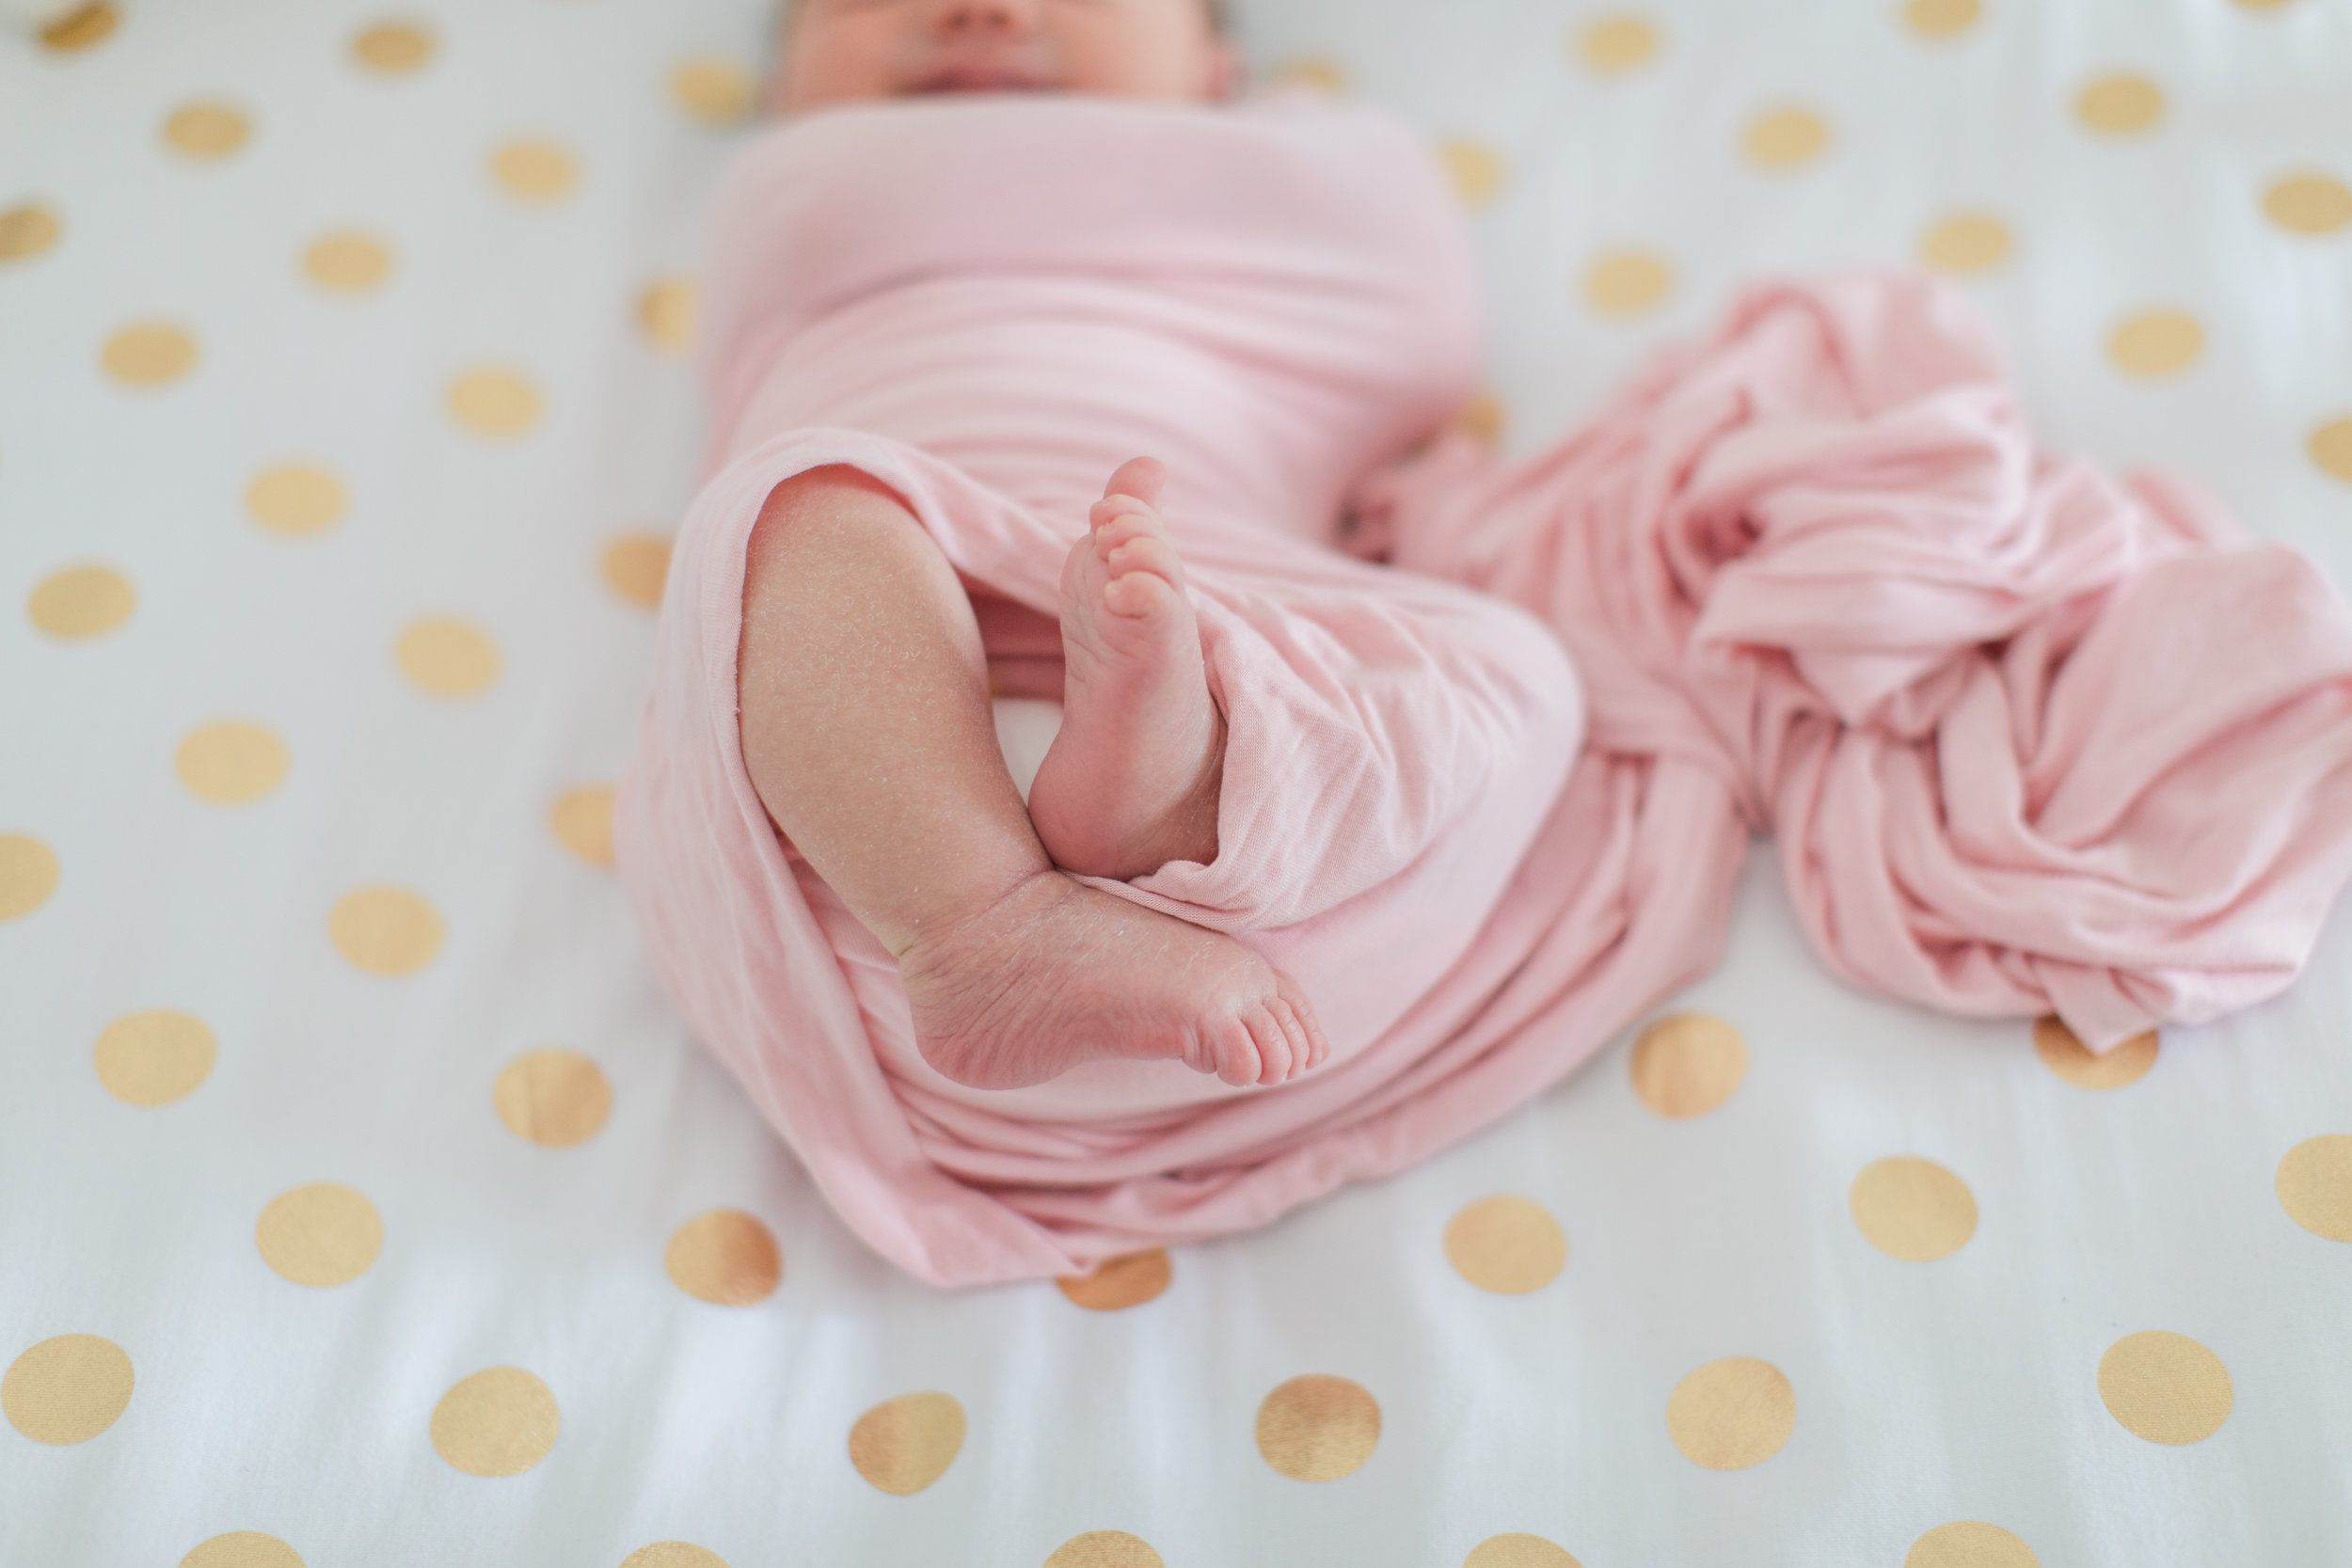 Newborn baby girl feet